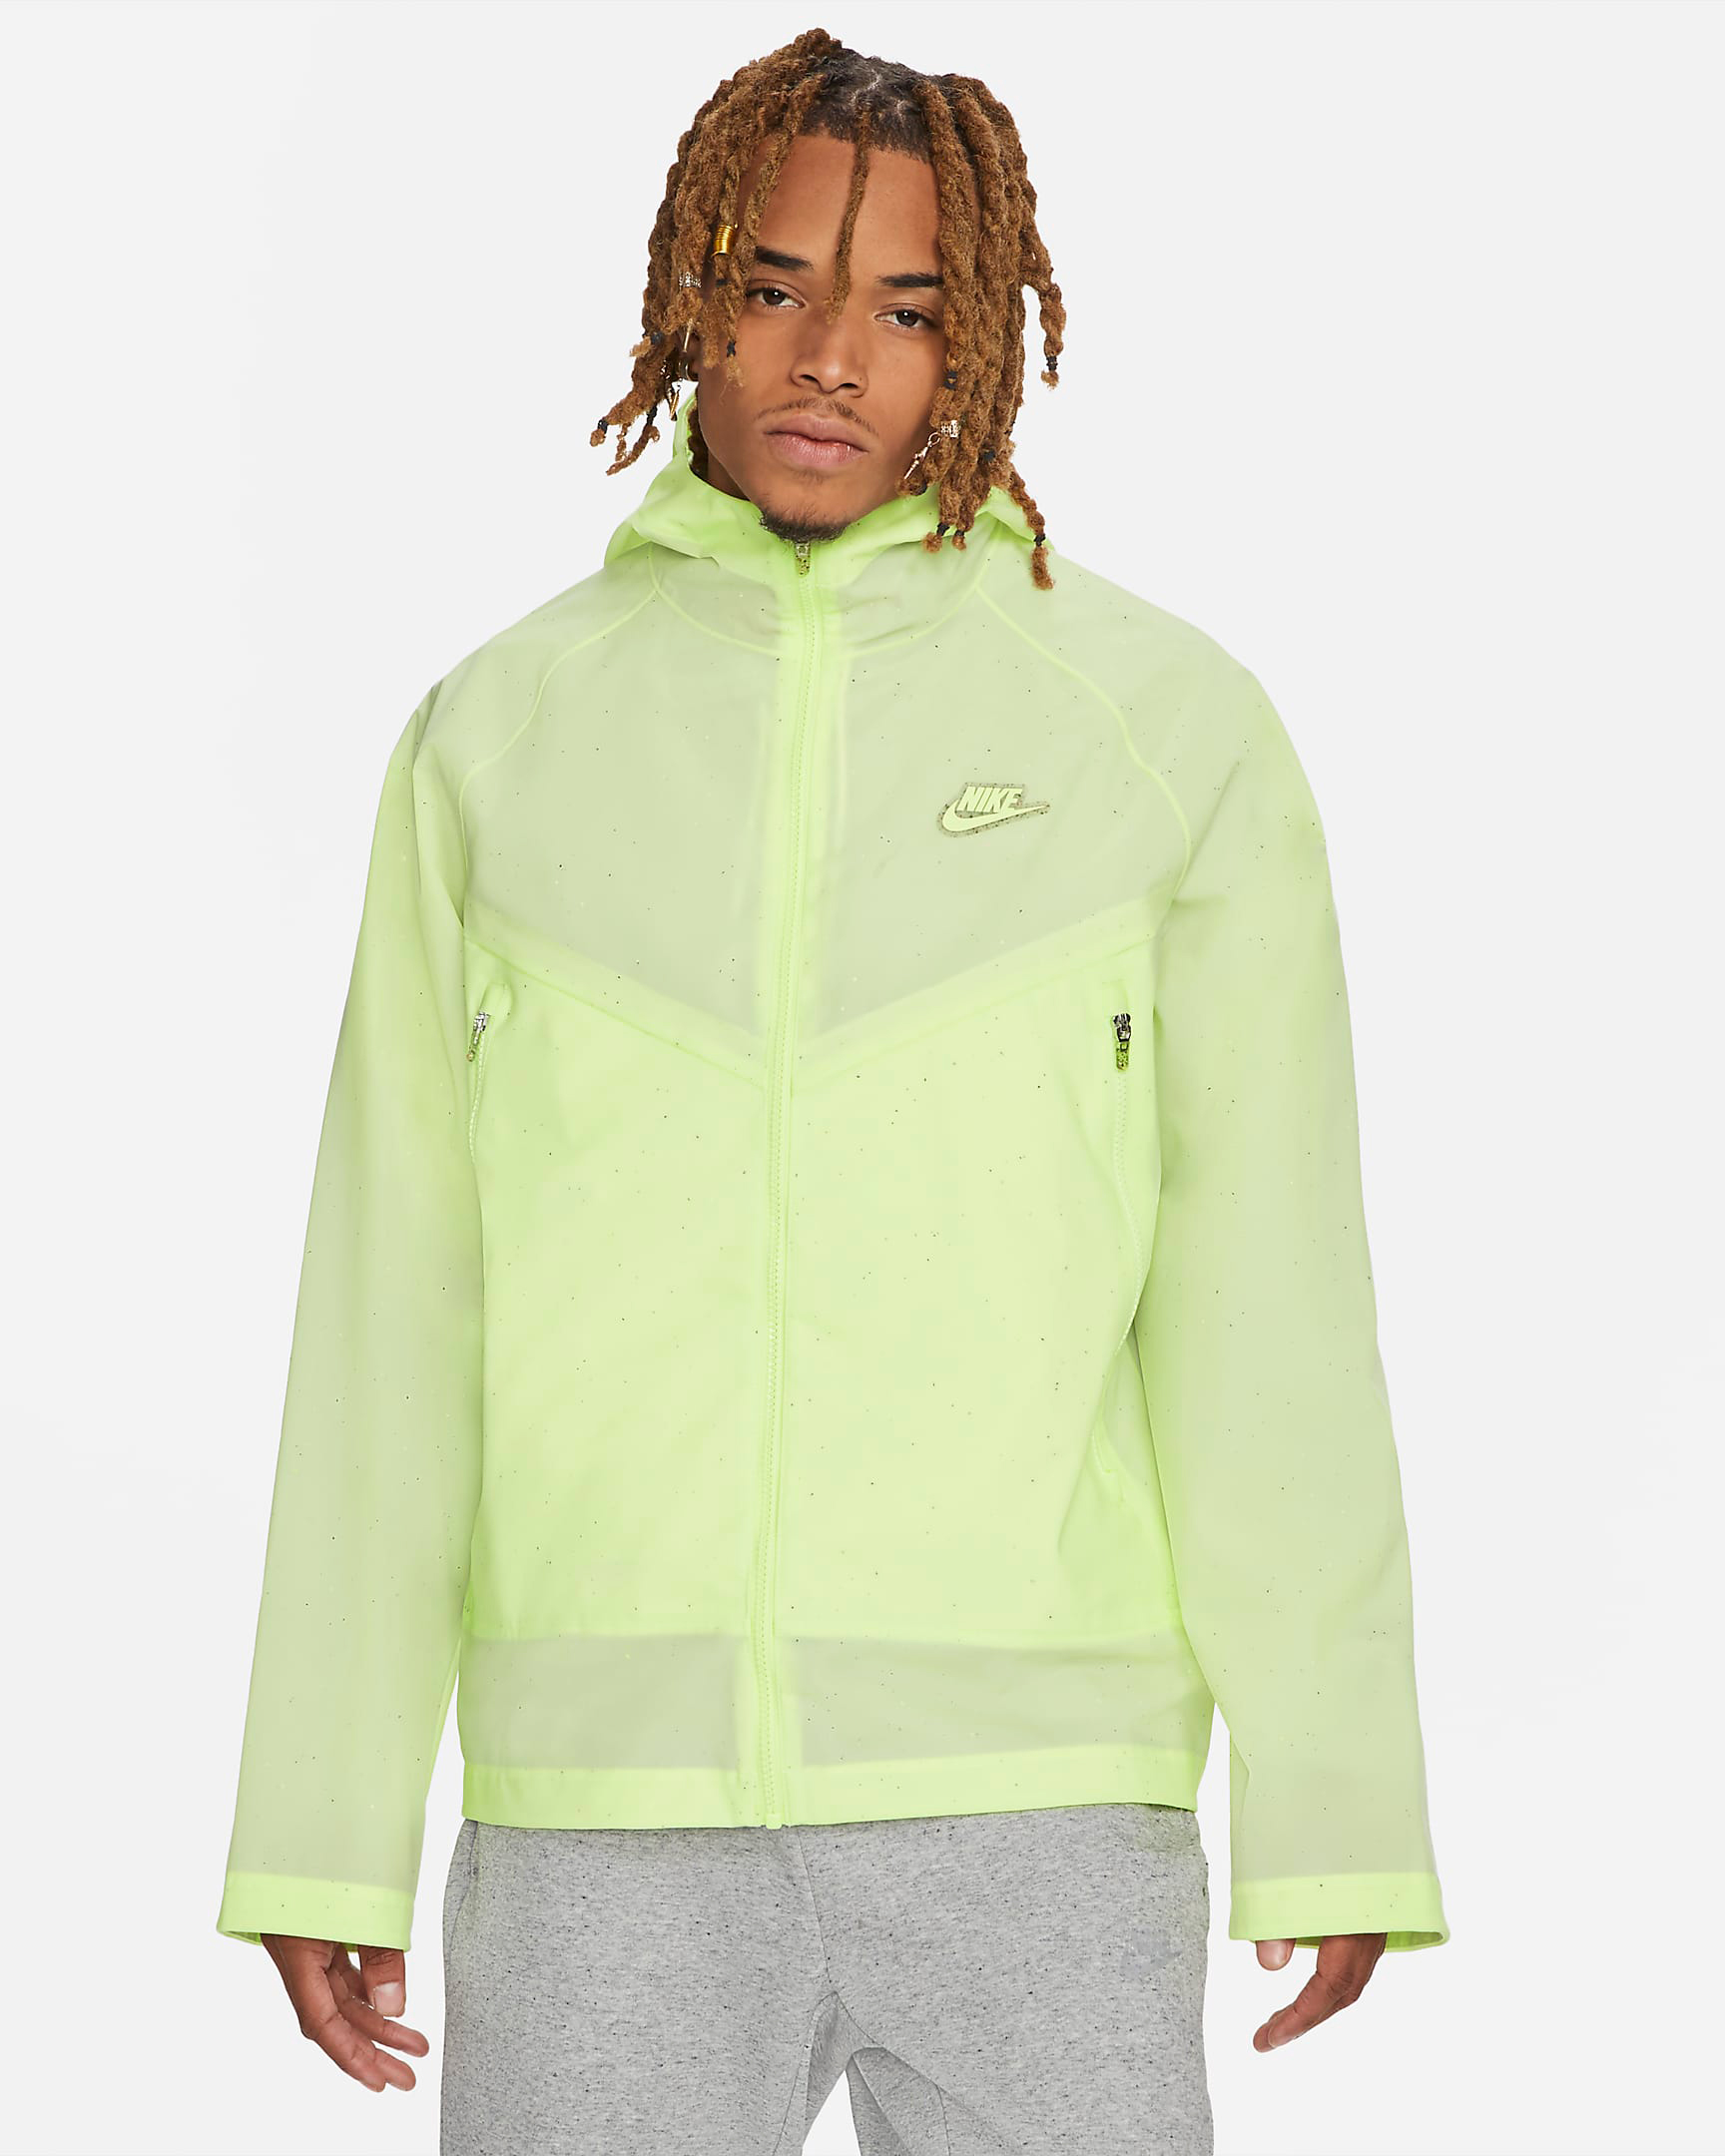 nike-volt-windrunner-jacket-1